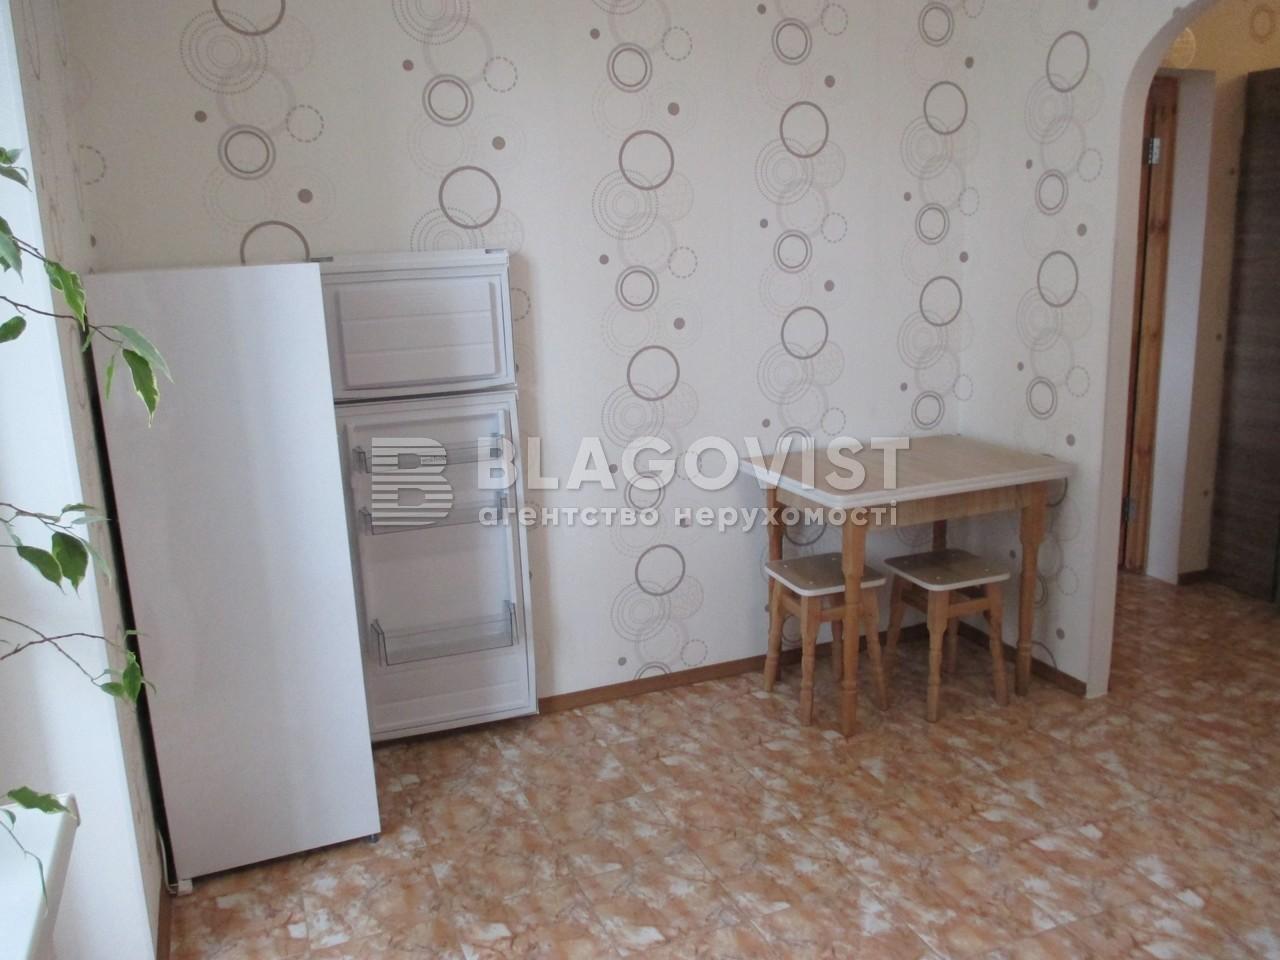 Квартира R-36704, Нижнеключевая, 14, Киев - Фото 10